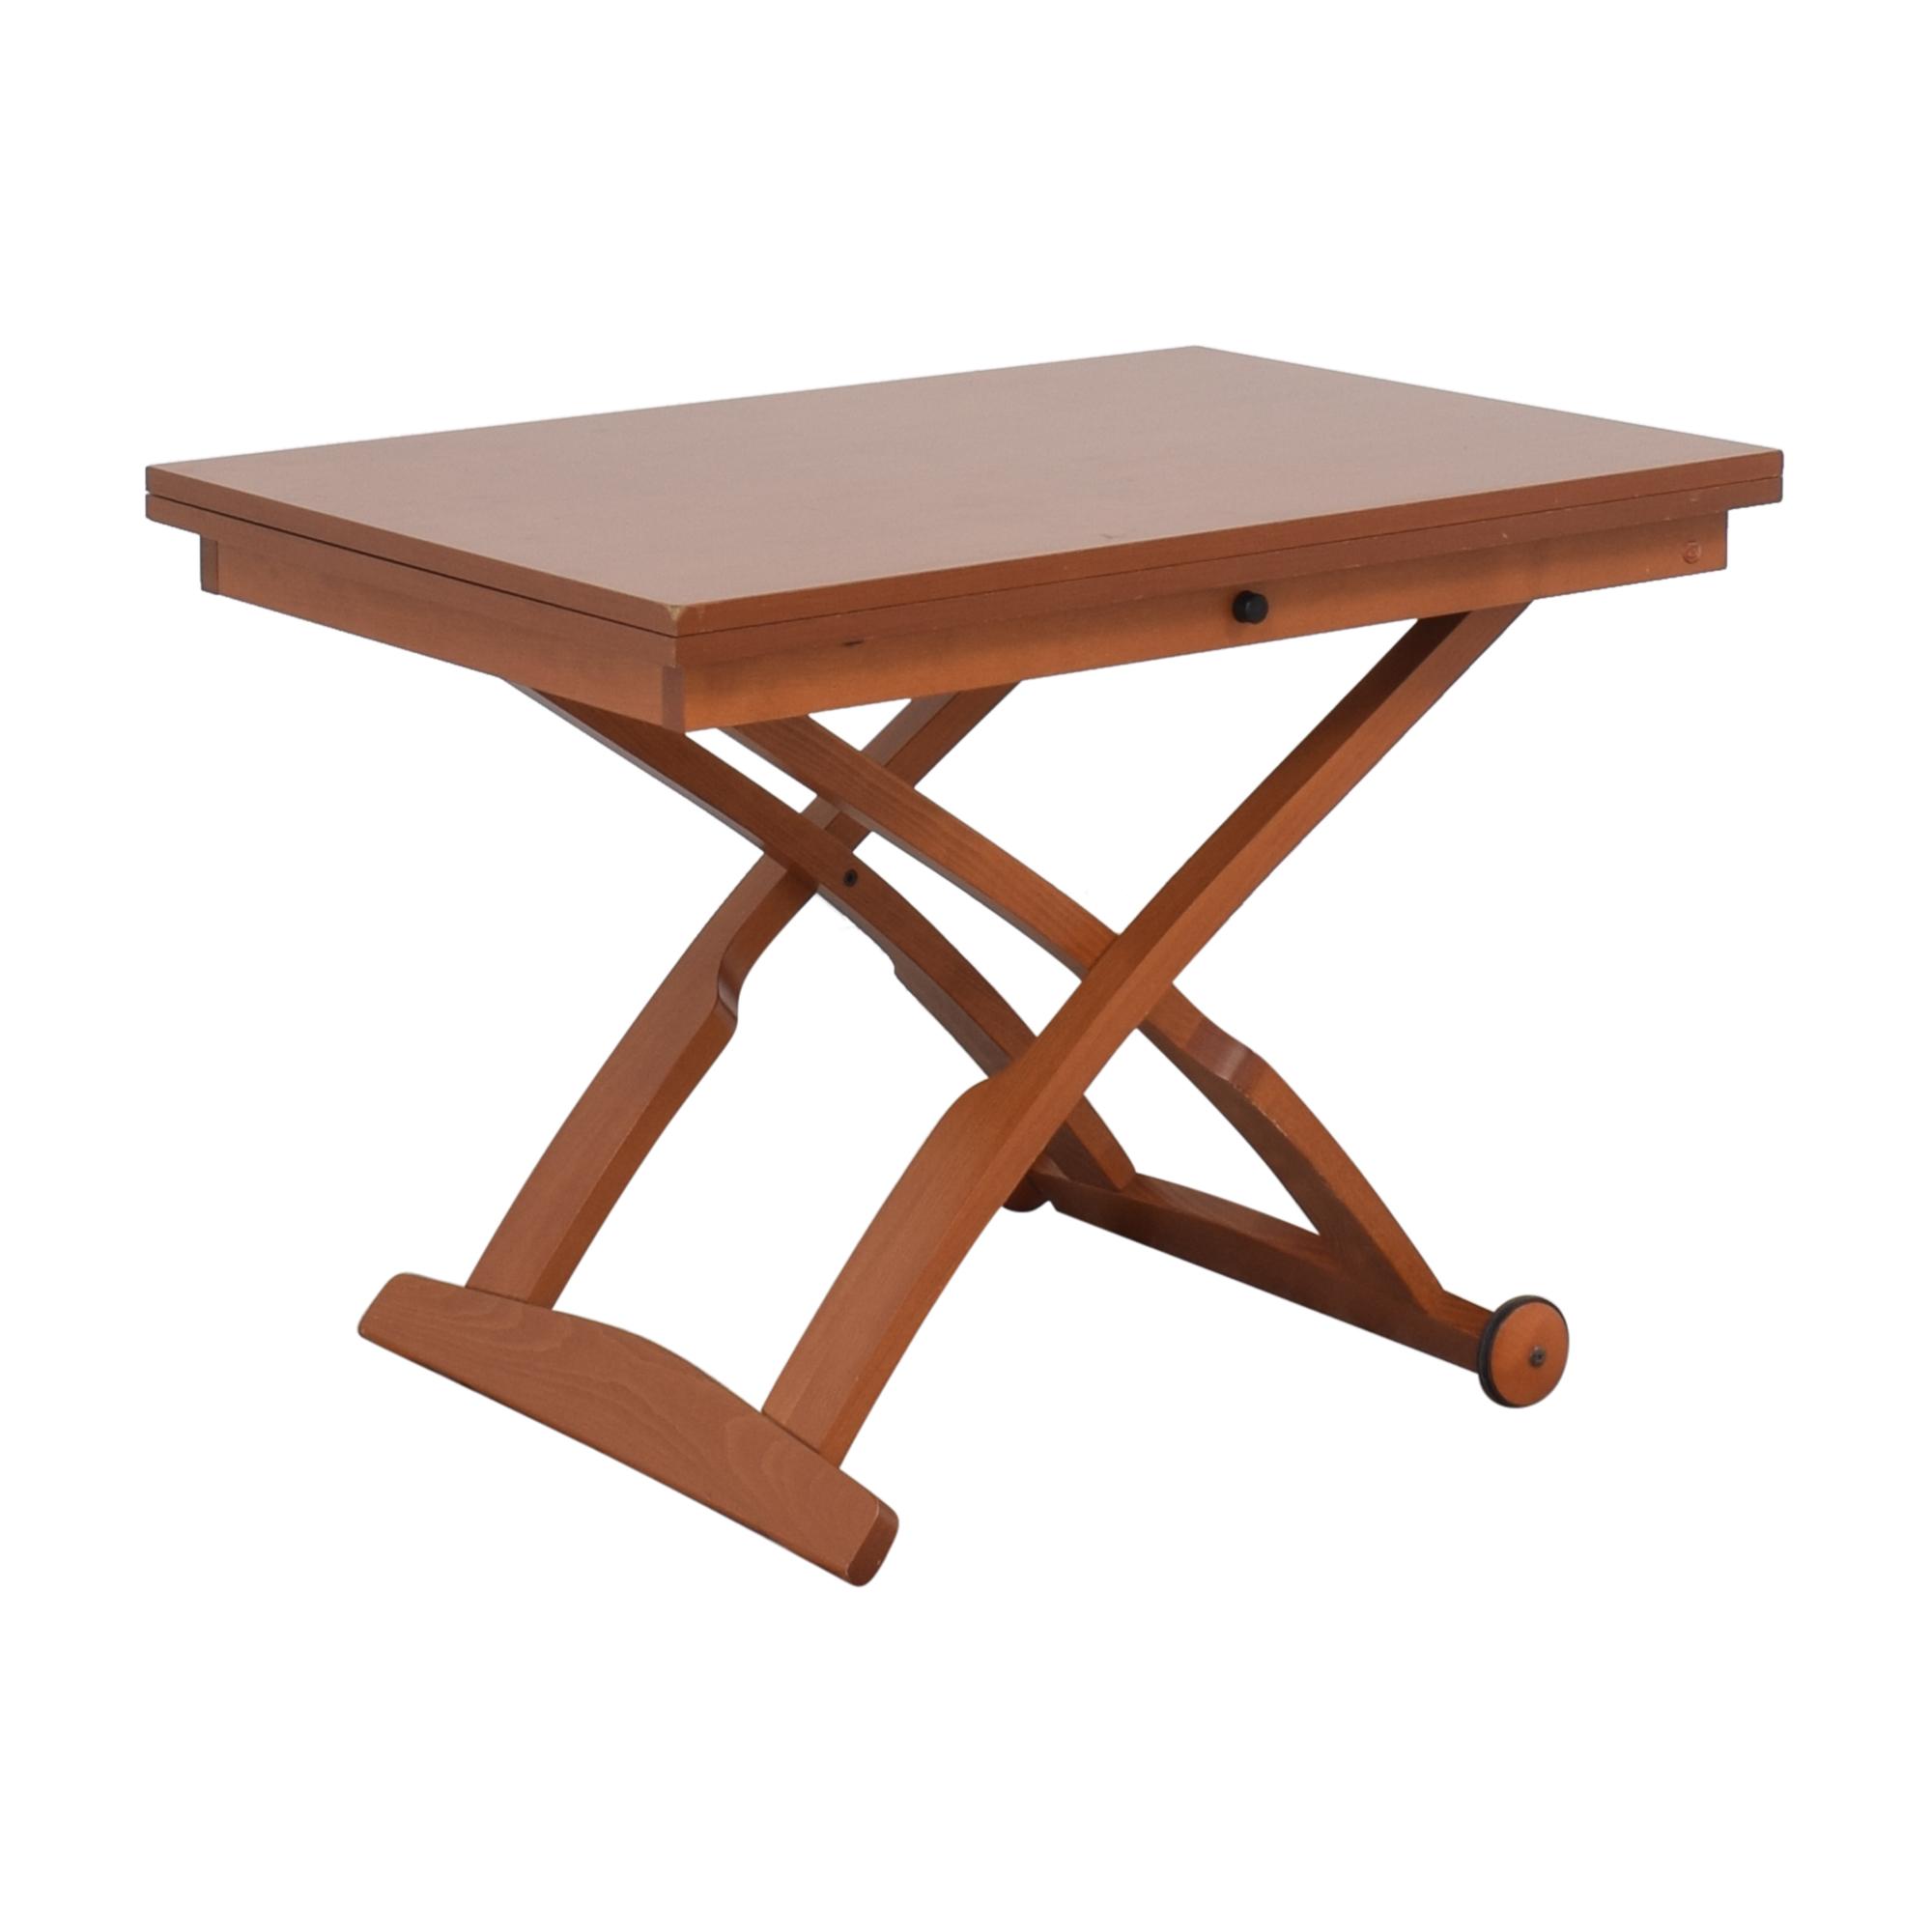 buy Calligaris Connubia Multipurpose Extension Table Calligaris Coffee Tables